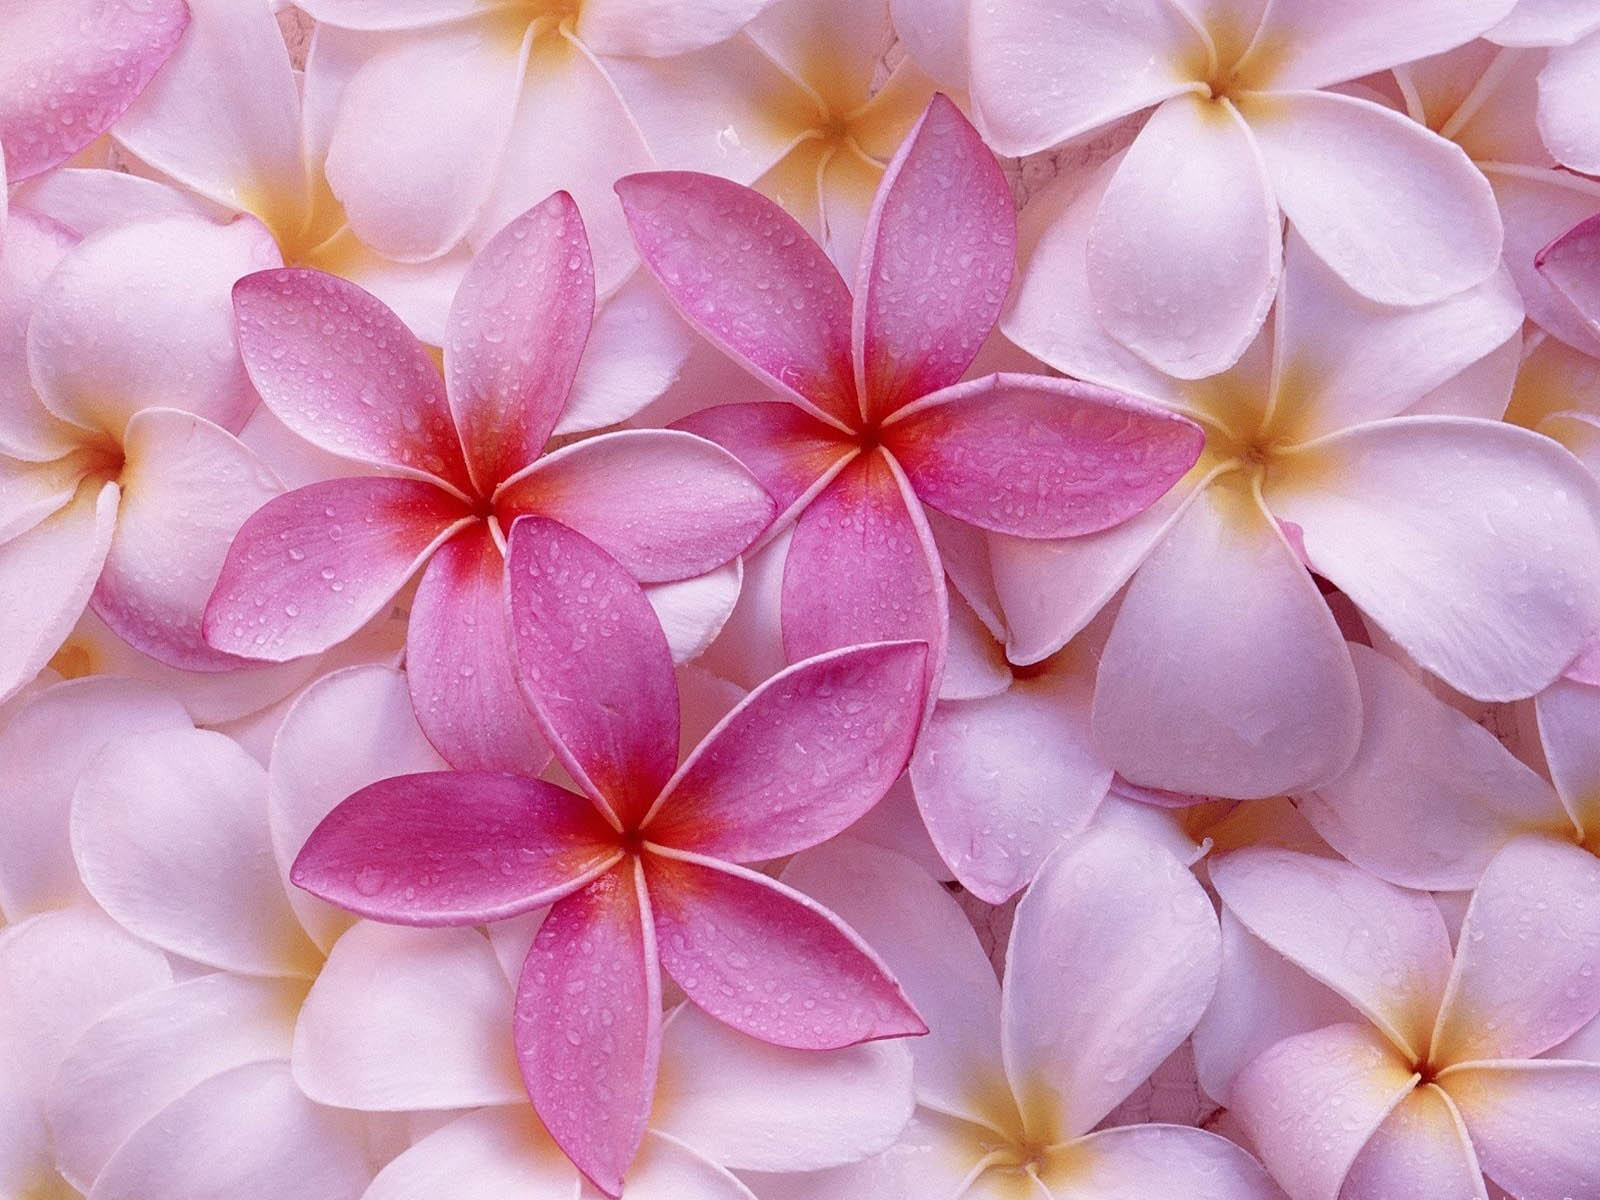 Gambar Gambar Bunga Berwarna Merah Muda Wallpapersforfree